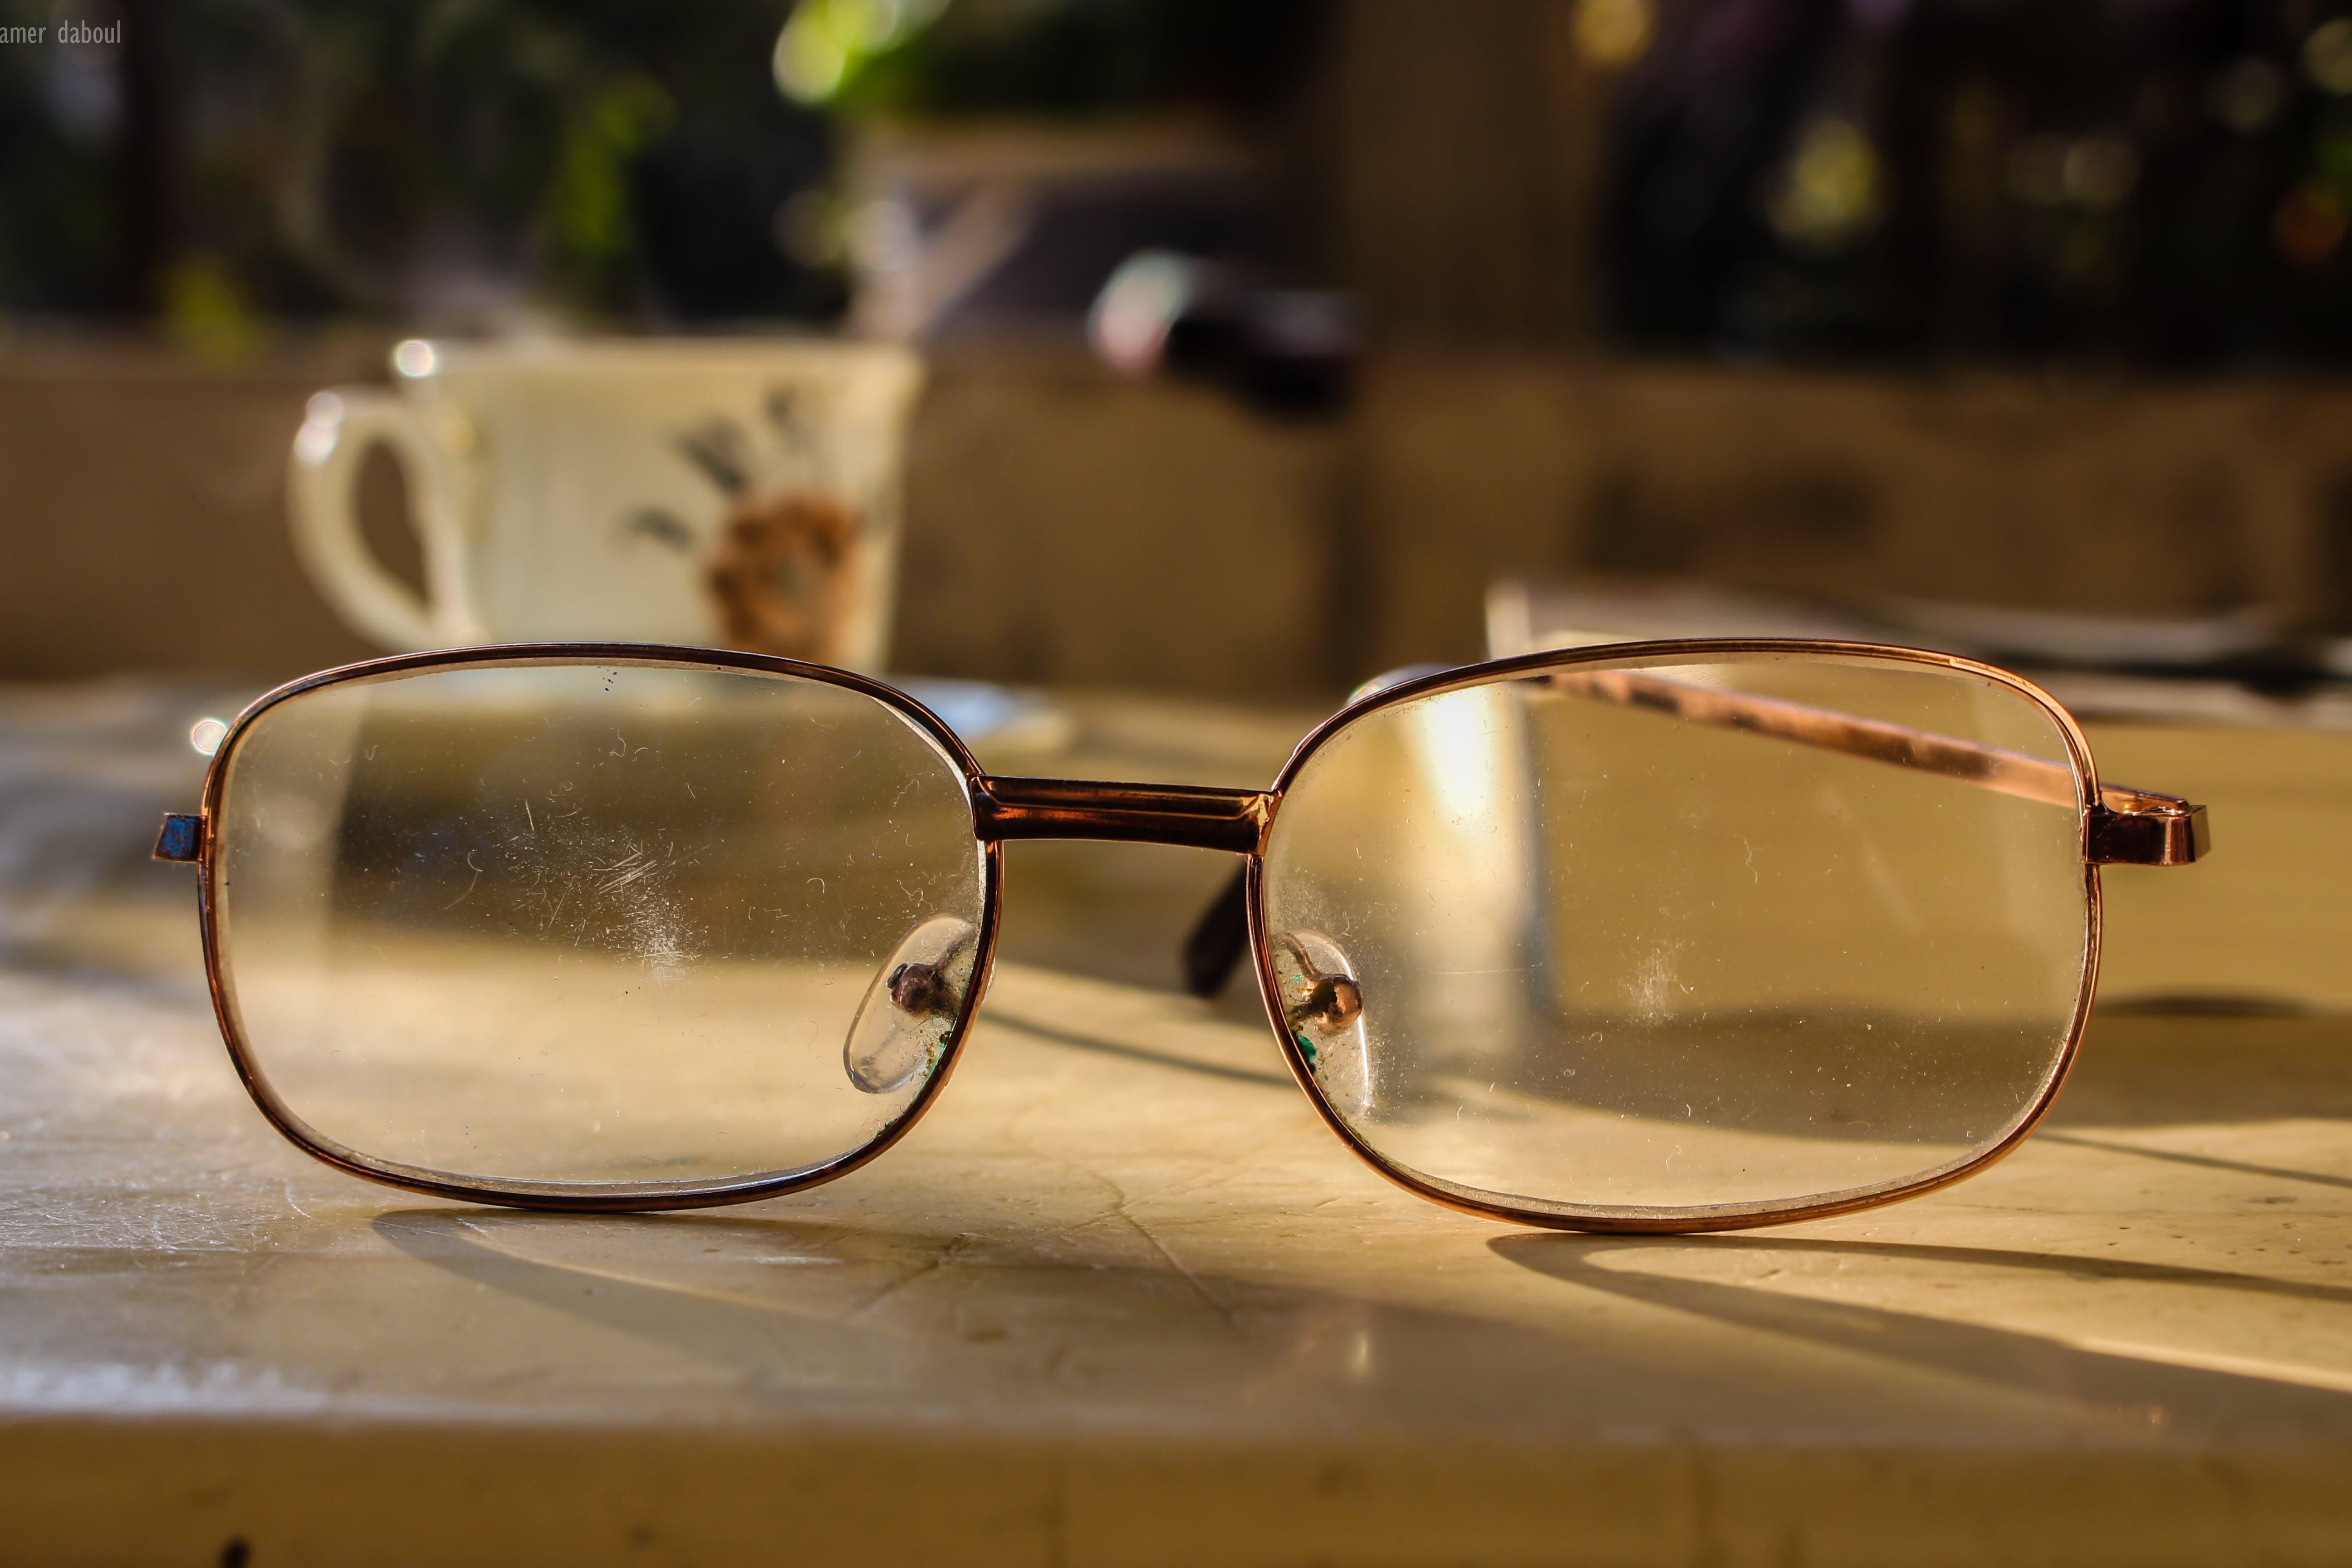 Free stock photo of close-up, coffee, education, eyeglasses